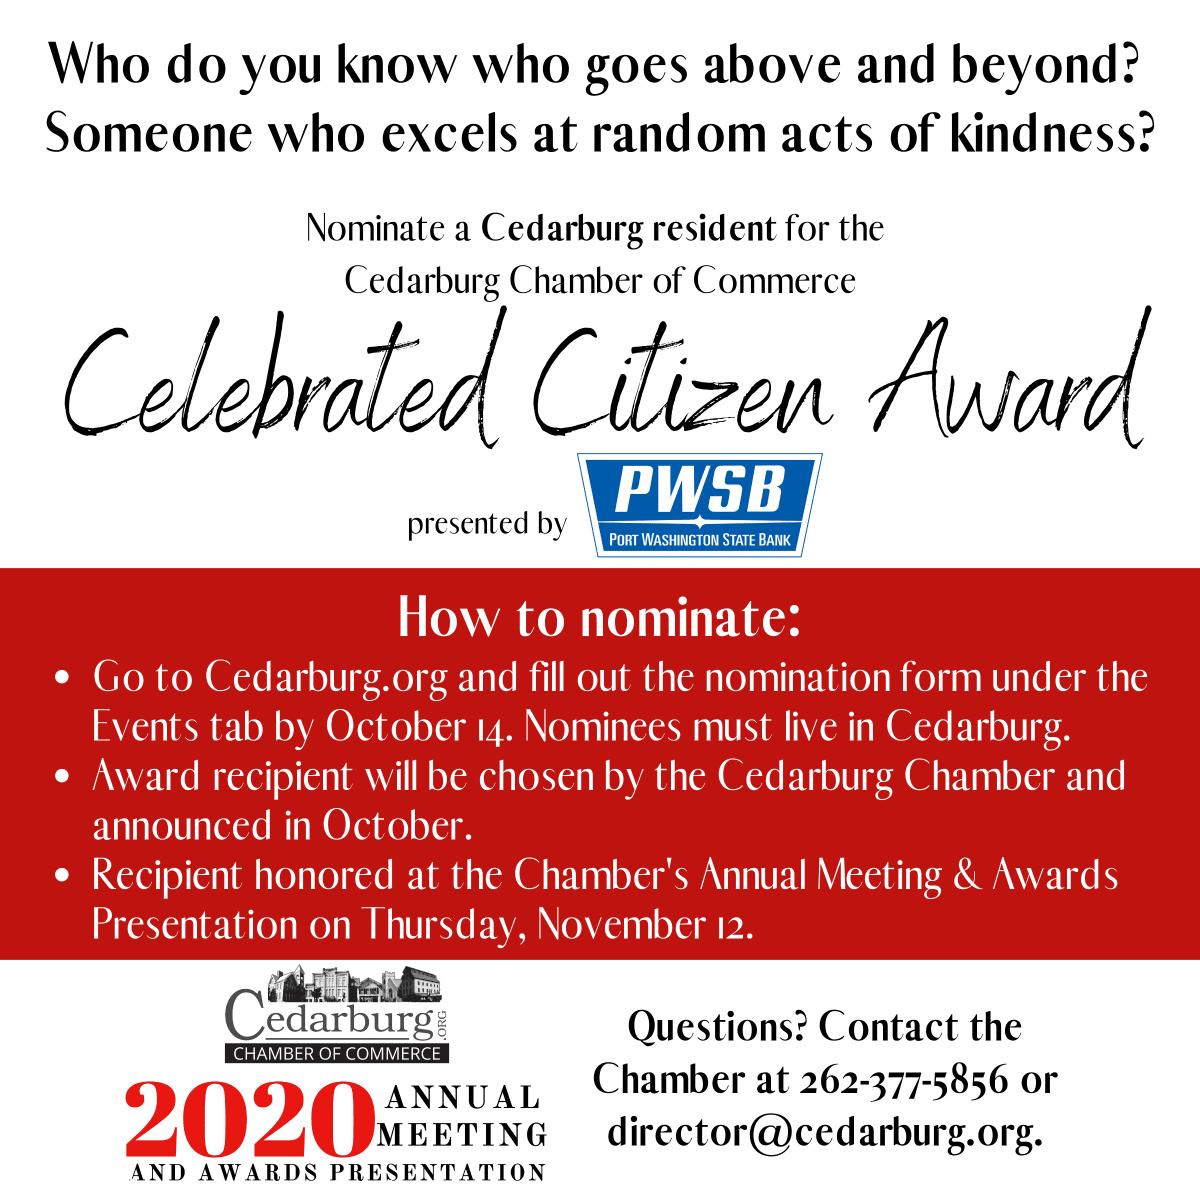 Celebrated-Cedarburg-Citizen-Award-(1)-w1200.png